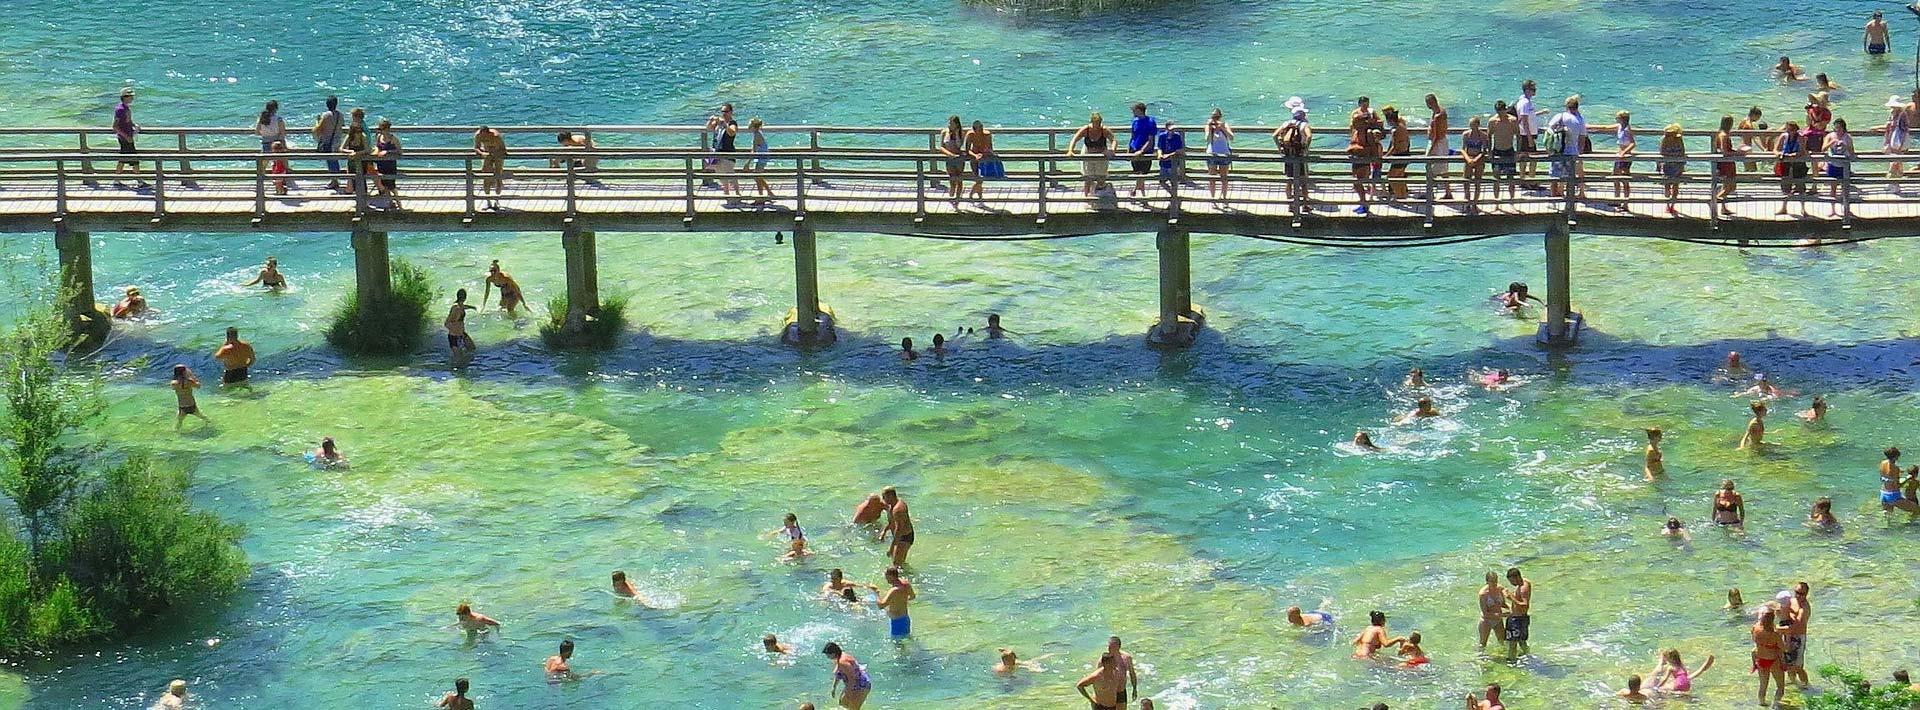 Split to Krka National Park, travel options